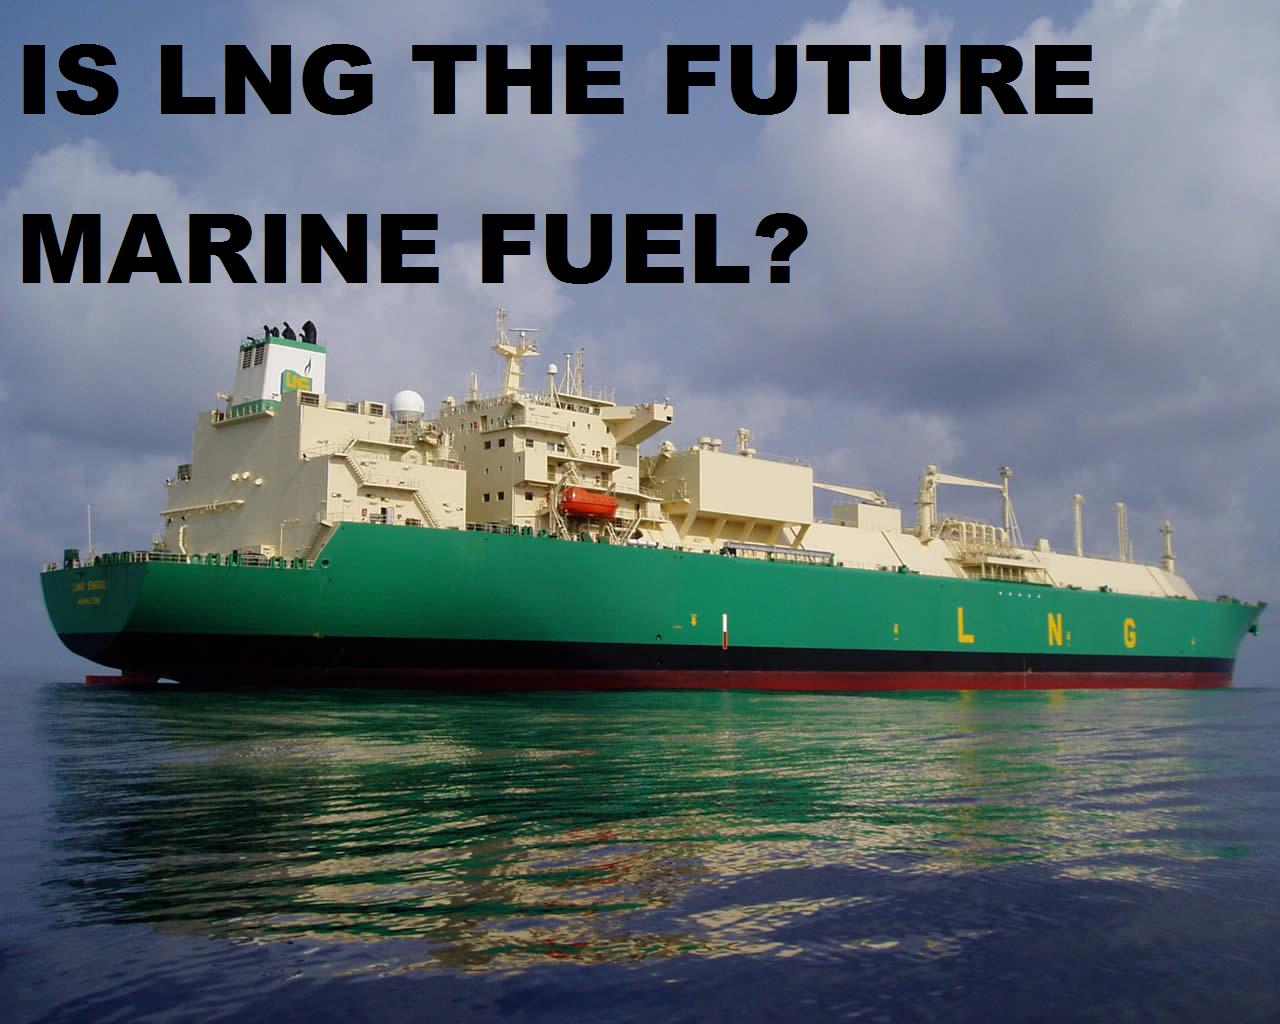 V Marine Fuels The World of Shipping ...